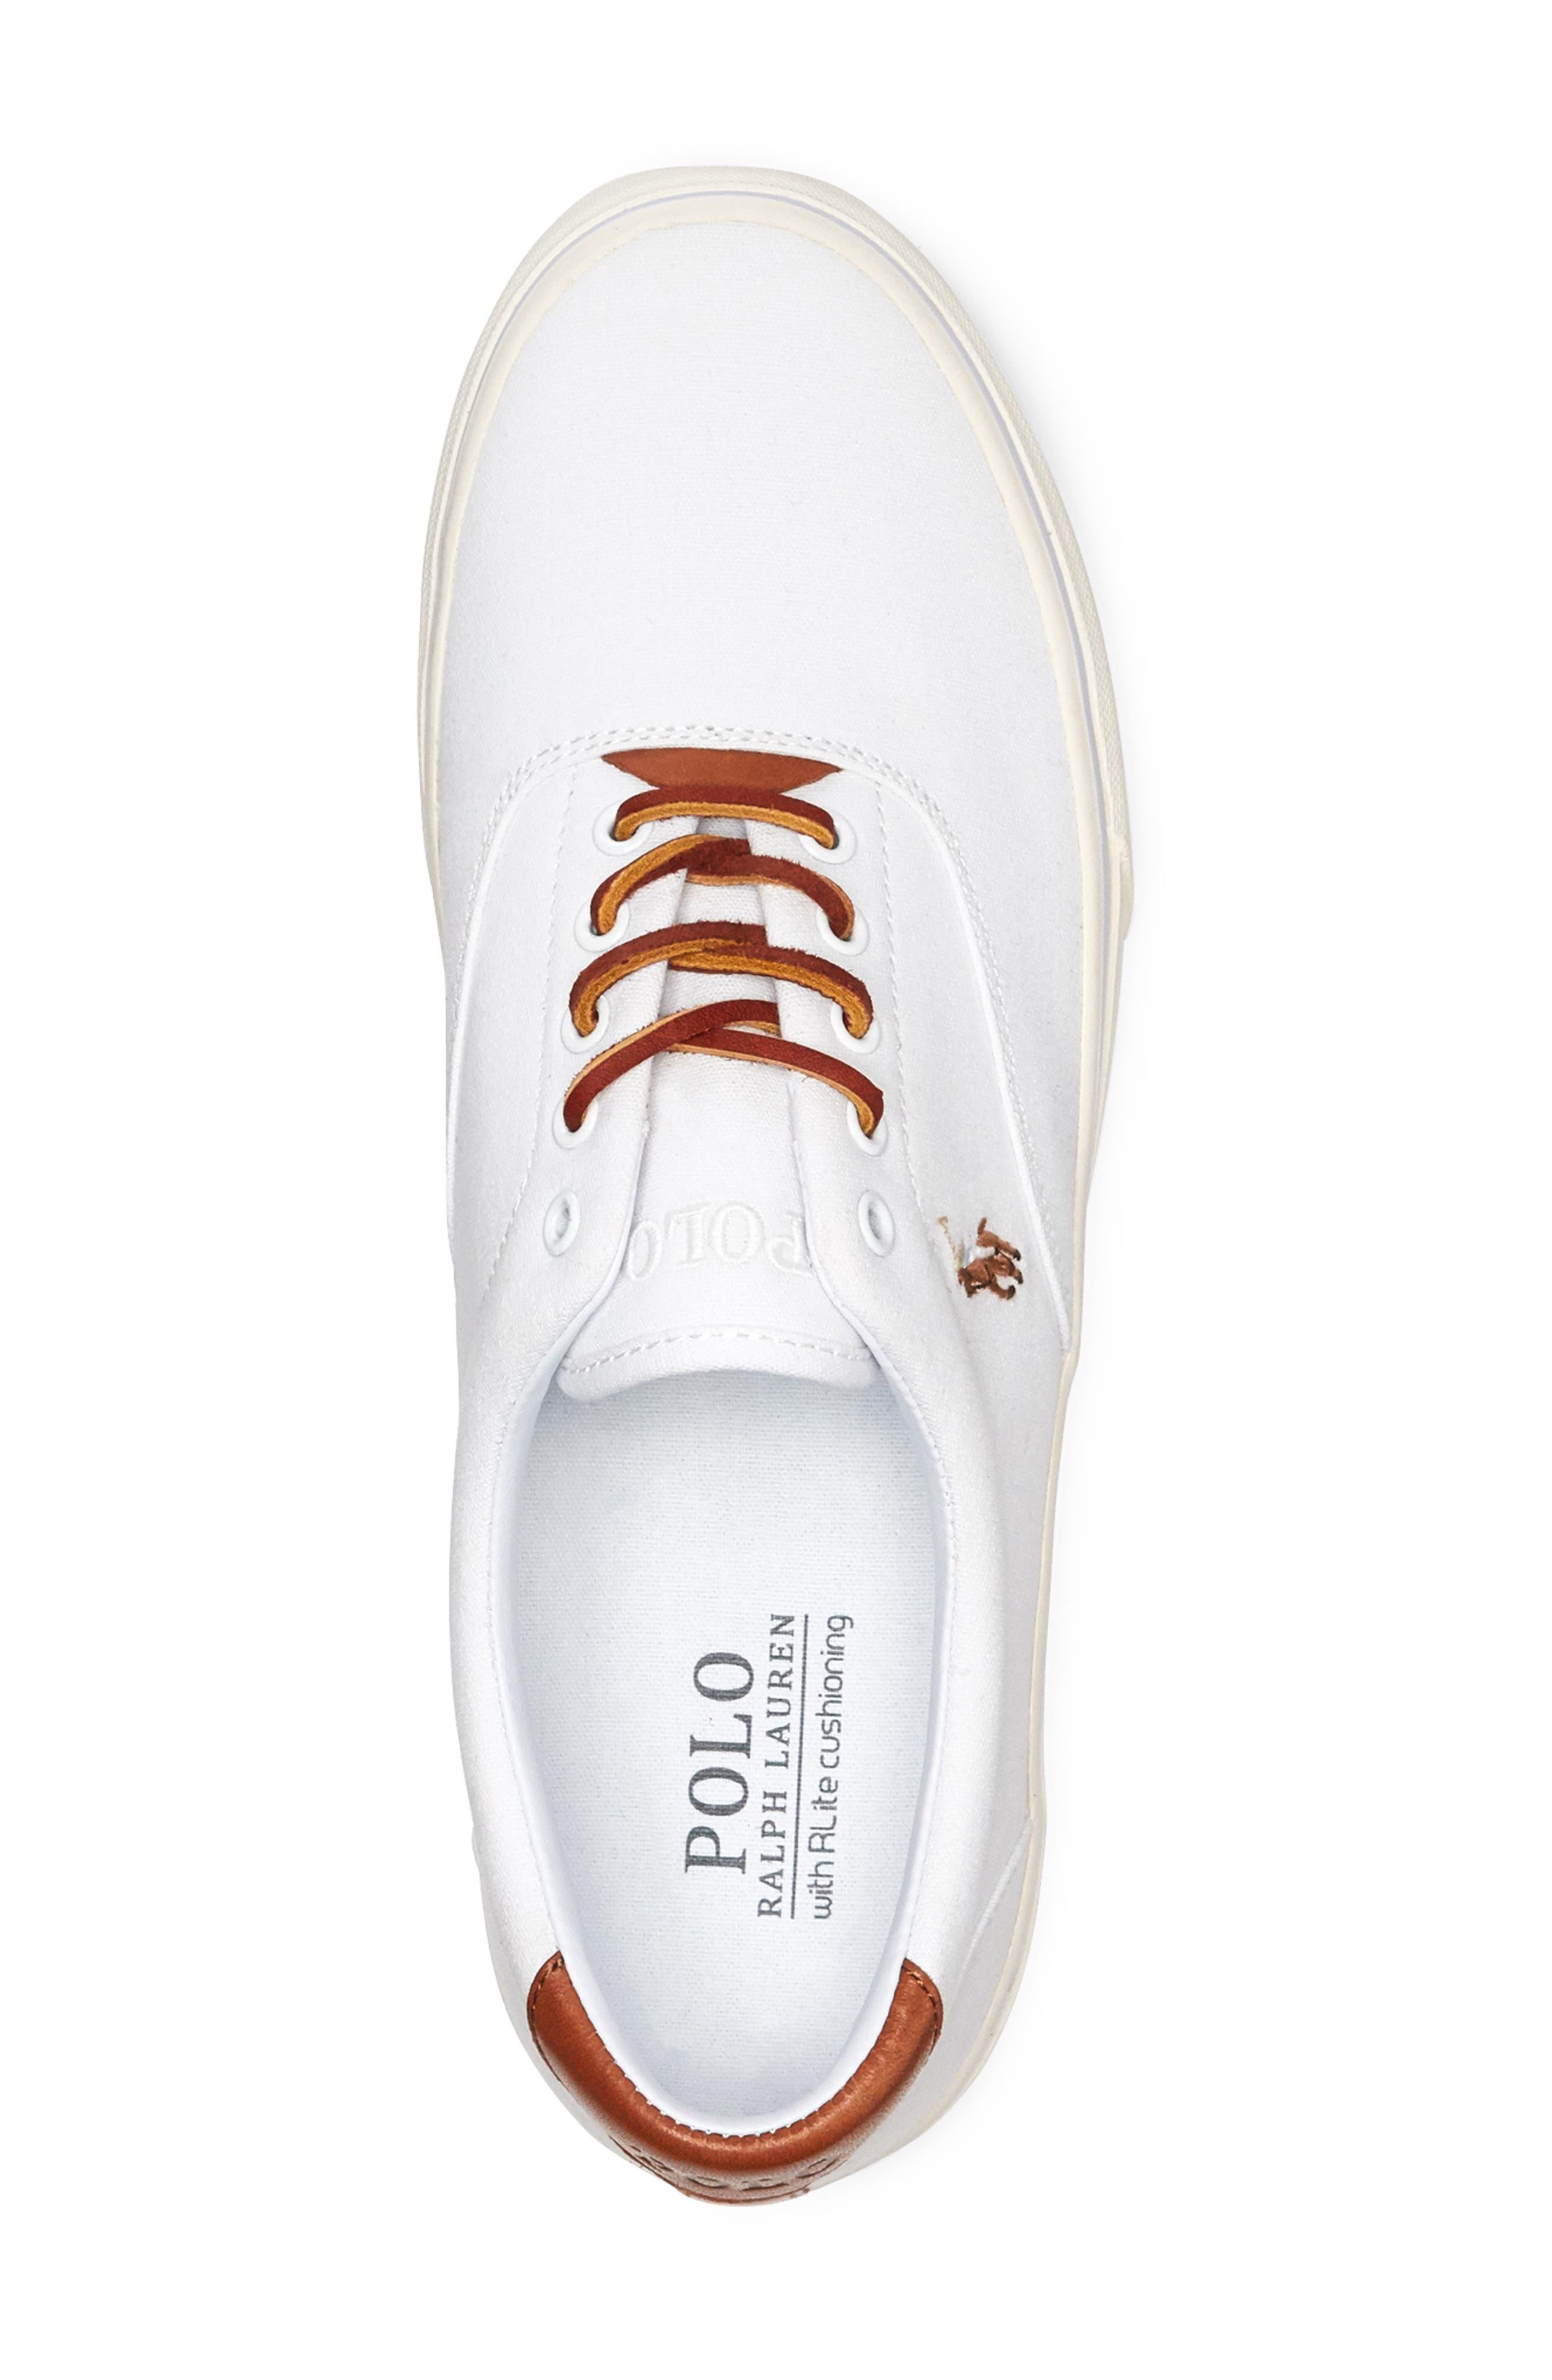 POLO RALPH LAUREN,                             Thorton Low Top Sneaker,                             Alternate thumbnail 3, color,                             WHITE CANVAS